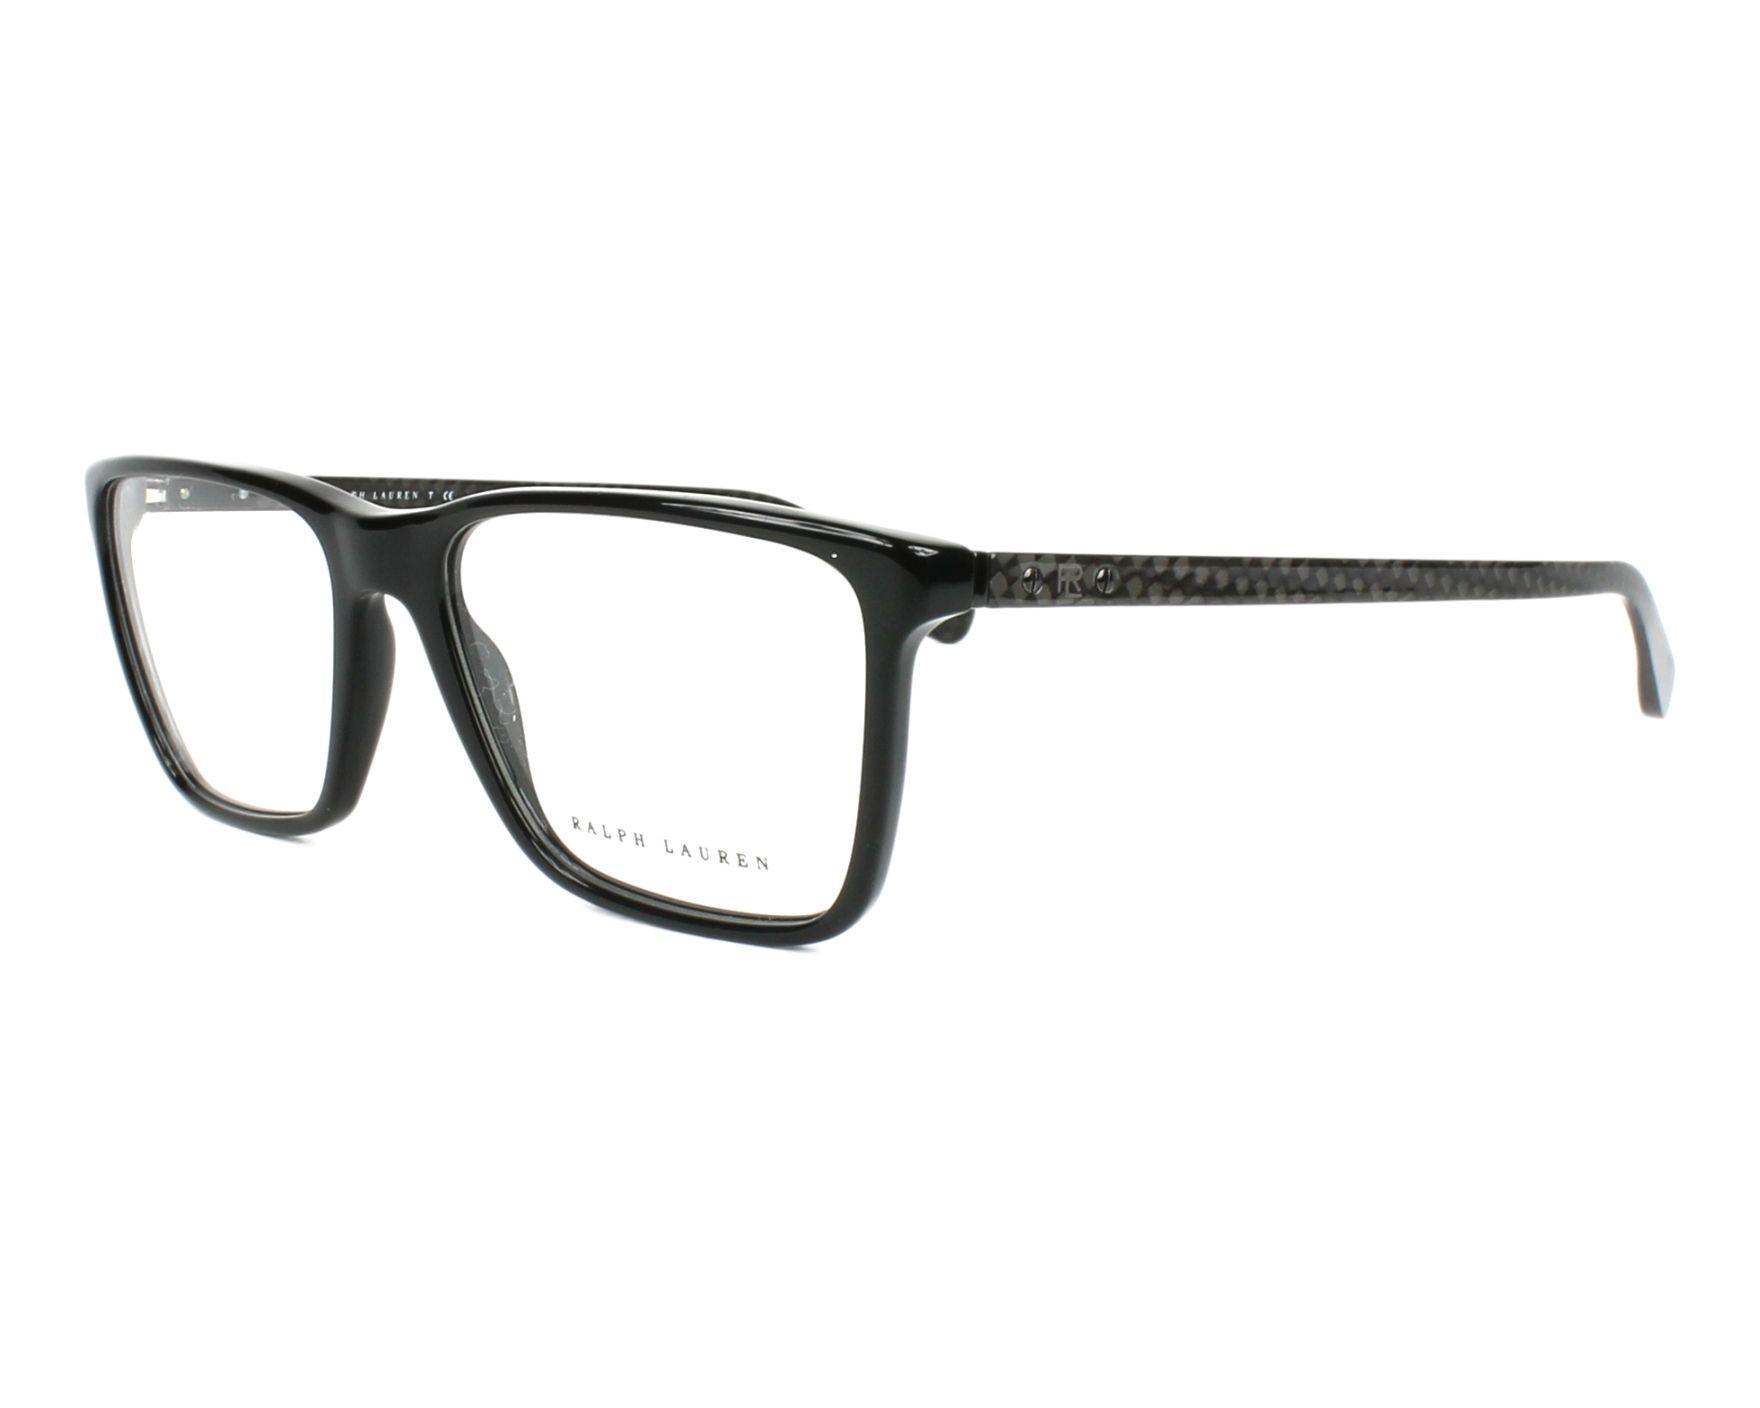 53607c4047 Gafas Graduadas Ralph Lauren RL-6163 5001 53-17 Negra Carbon vista de perfil